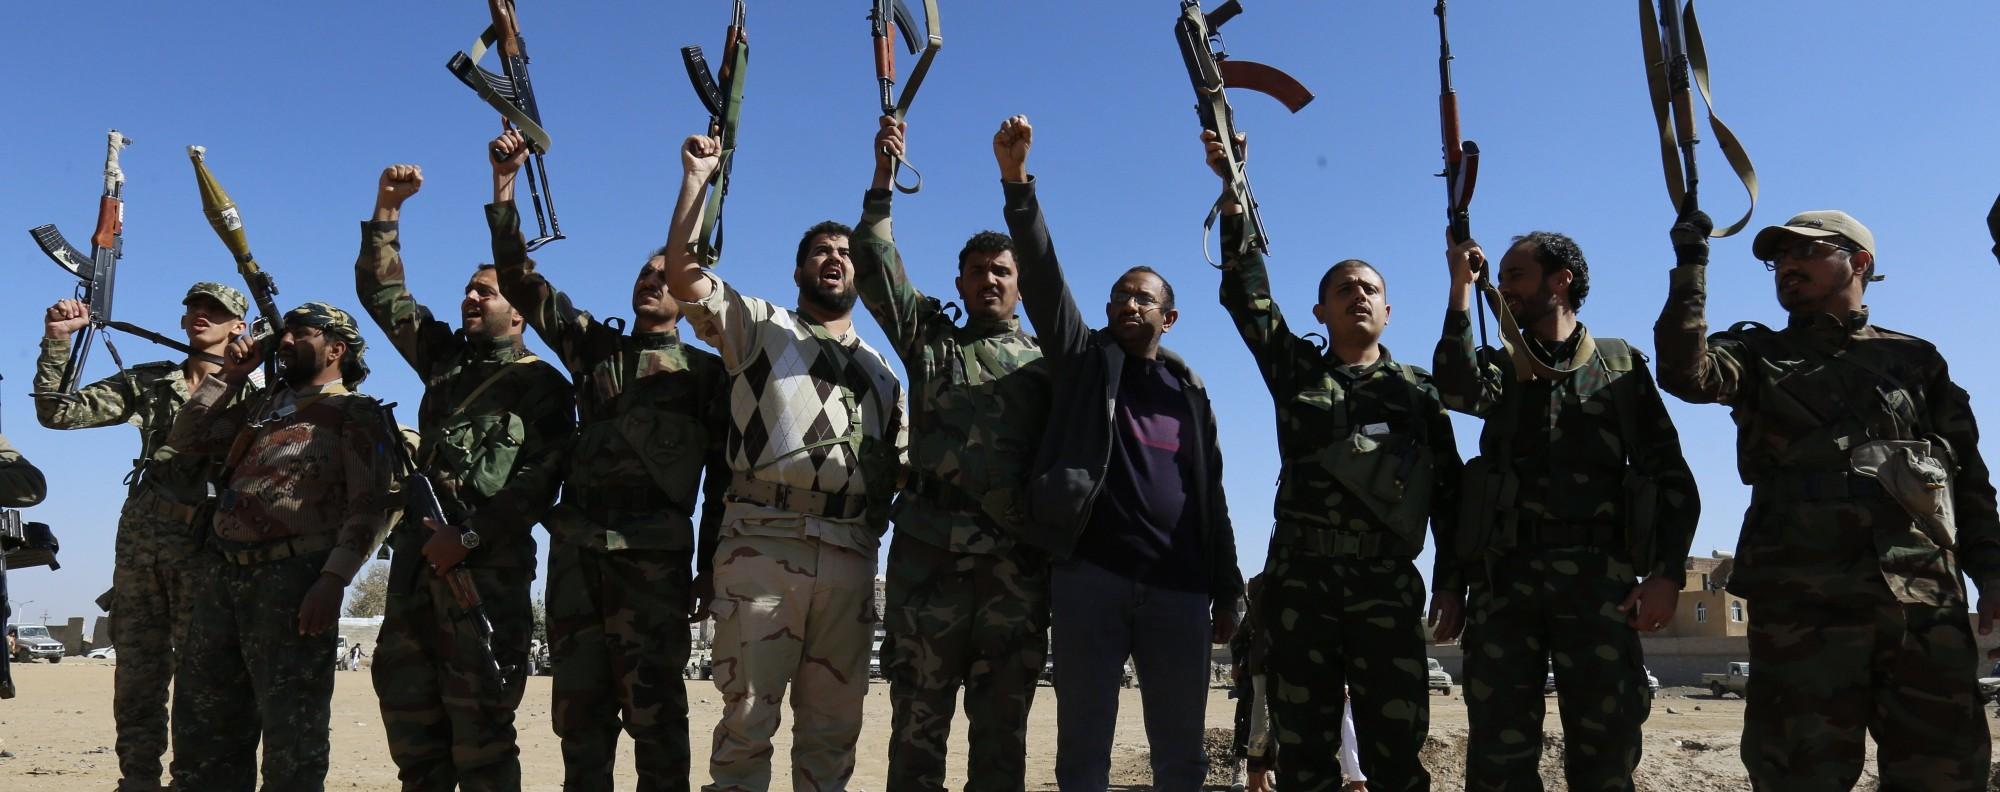 Houthi fighters in Sana'a, Yemen. Photo: EPA